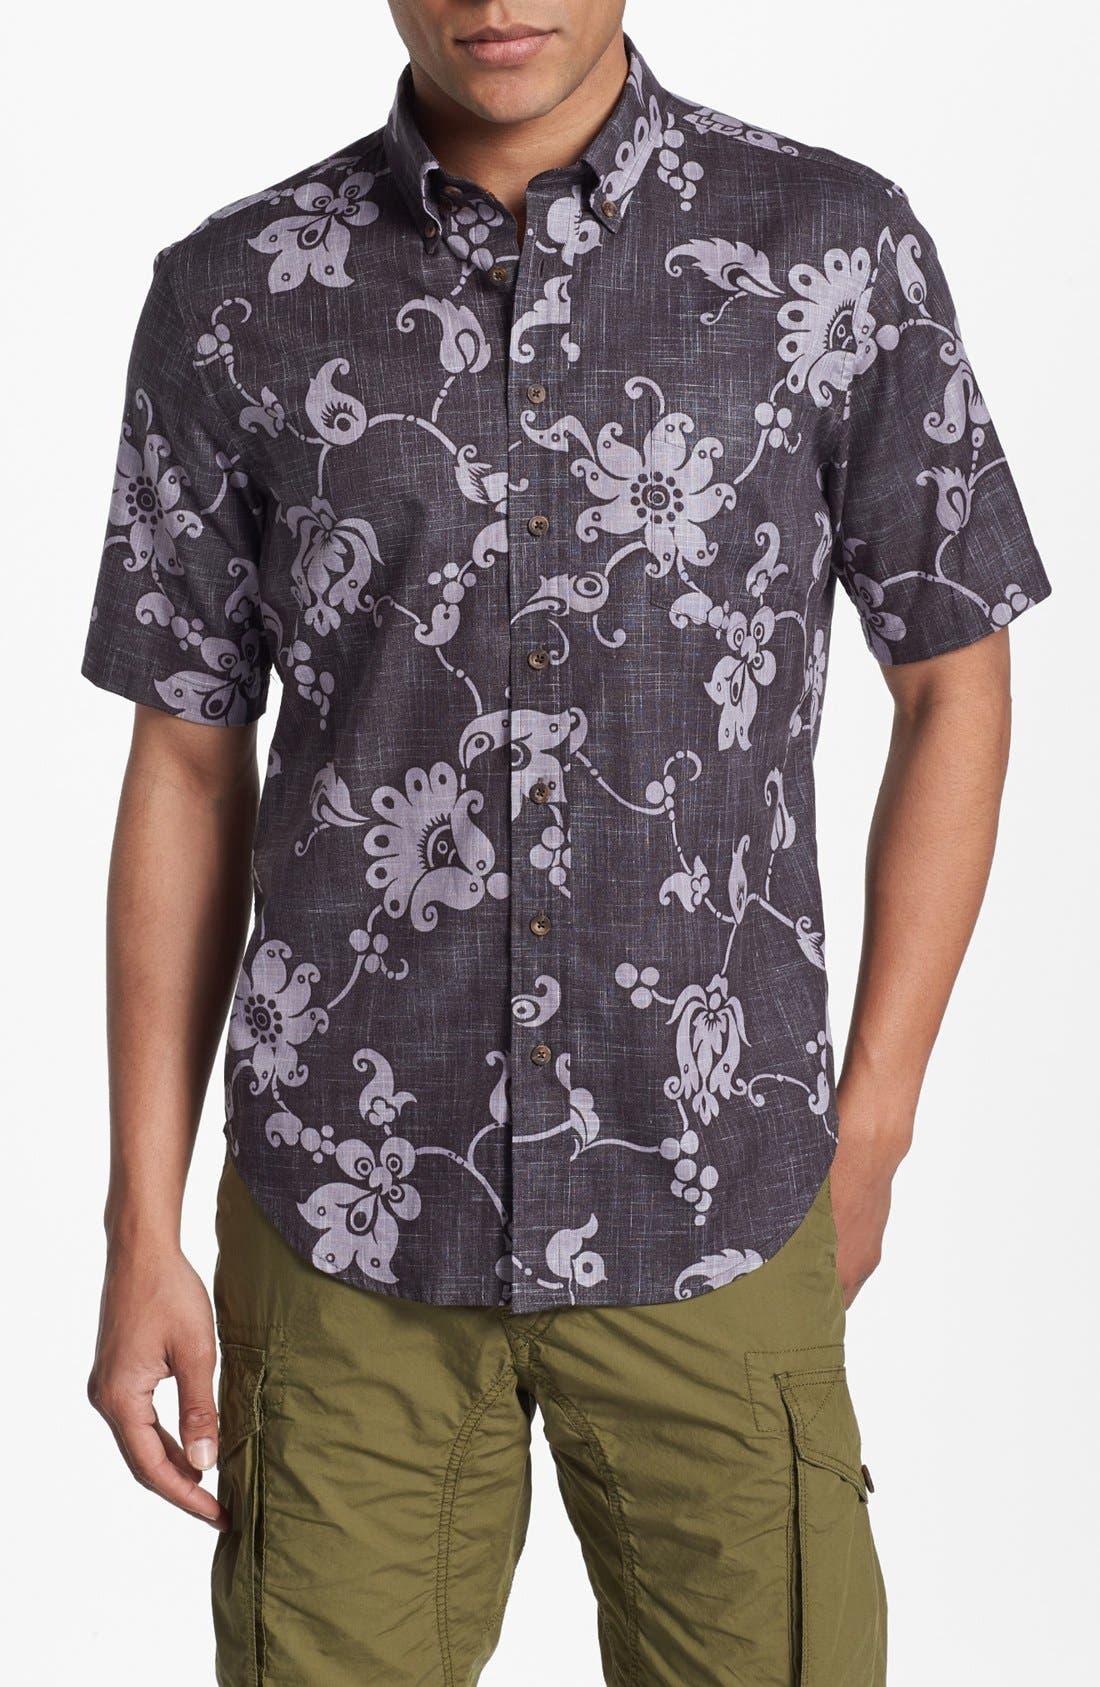 Alternate Image 1 Selected - Reyn Spooner 'Aloha Pareau' Print Woven Shirt